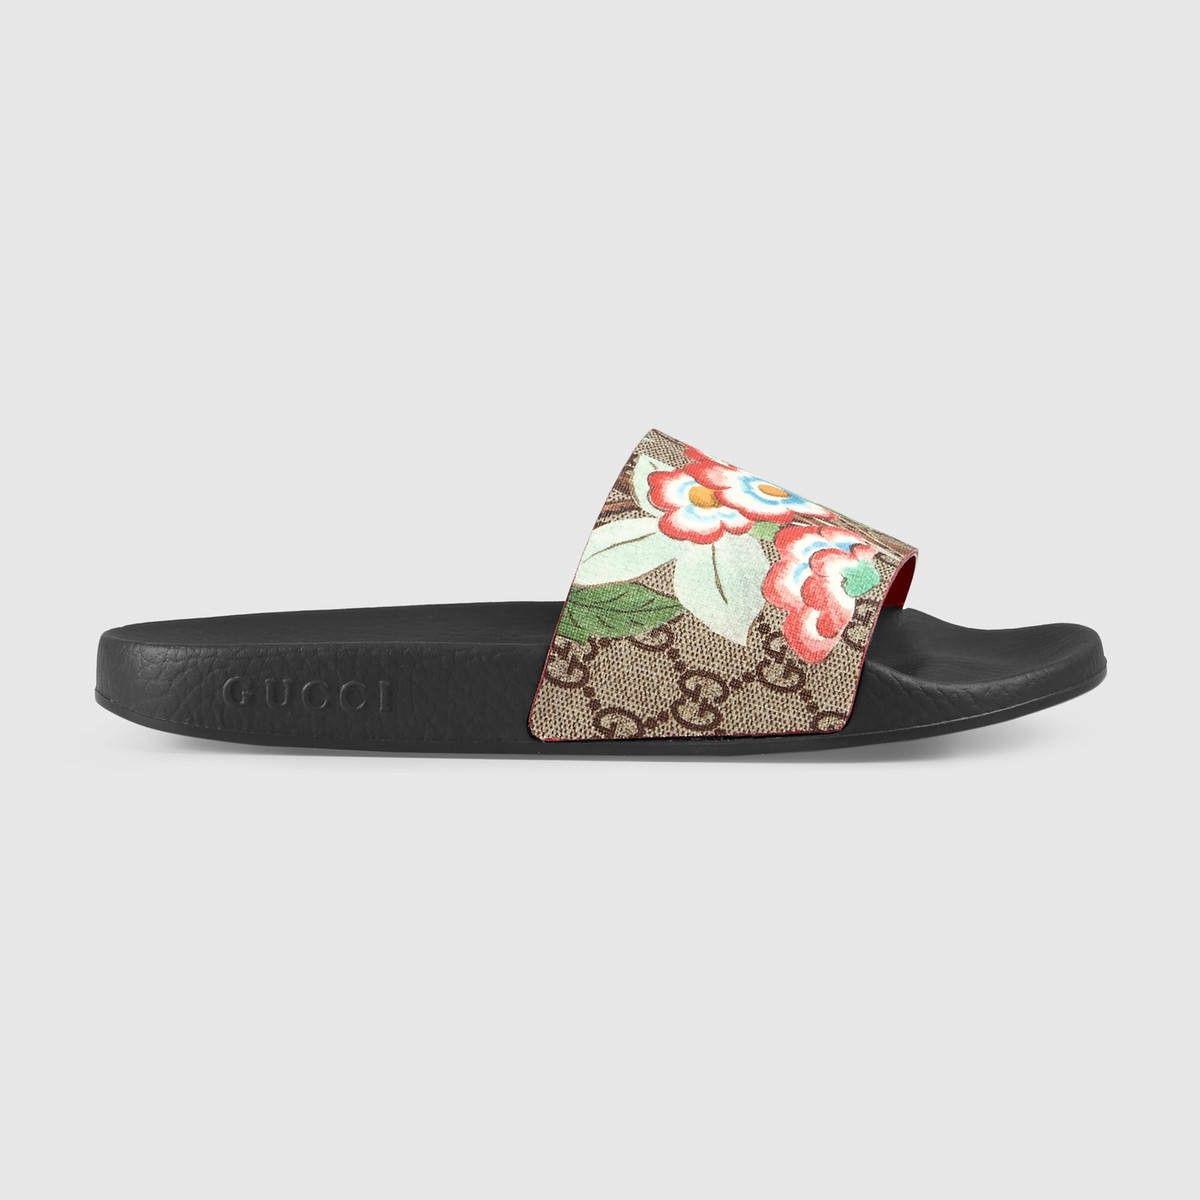 b88579b22 GUCCI Women's Gucci Tian slide sandal - GG Supreme tian. #gucci #shoes #